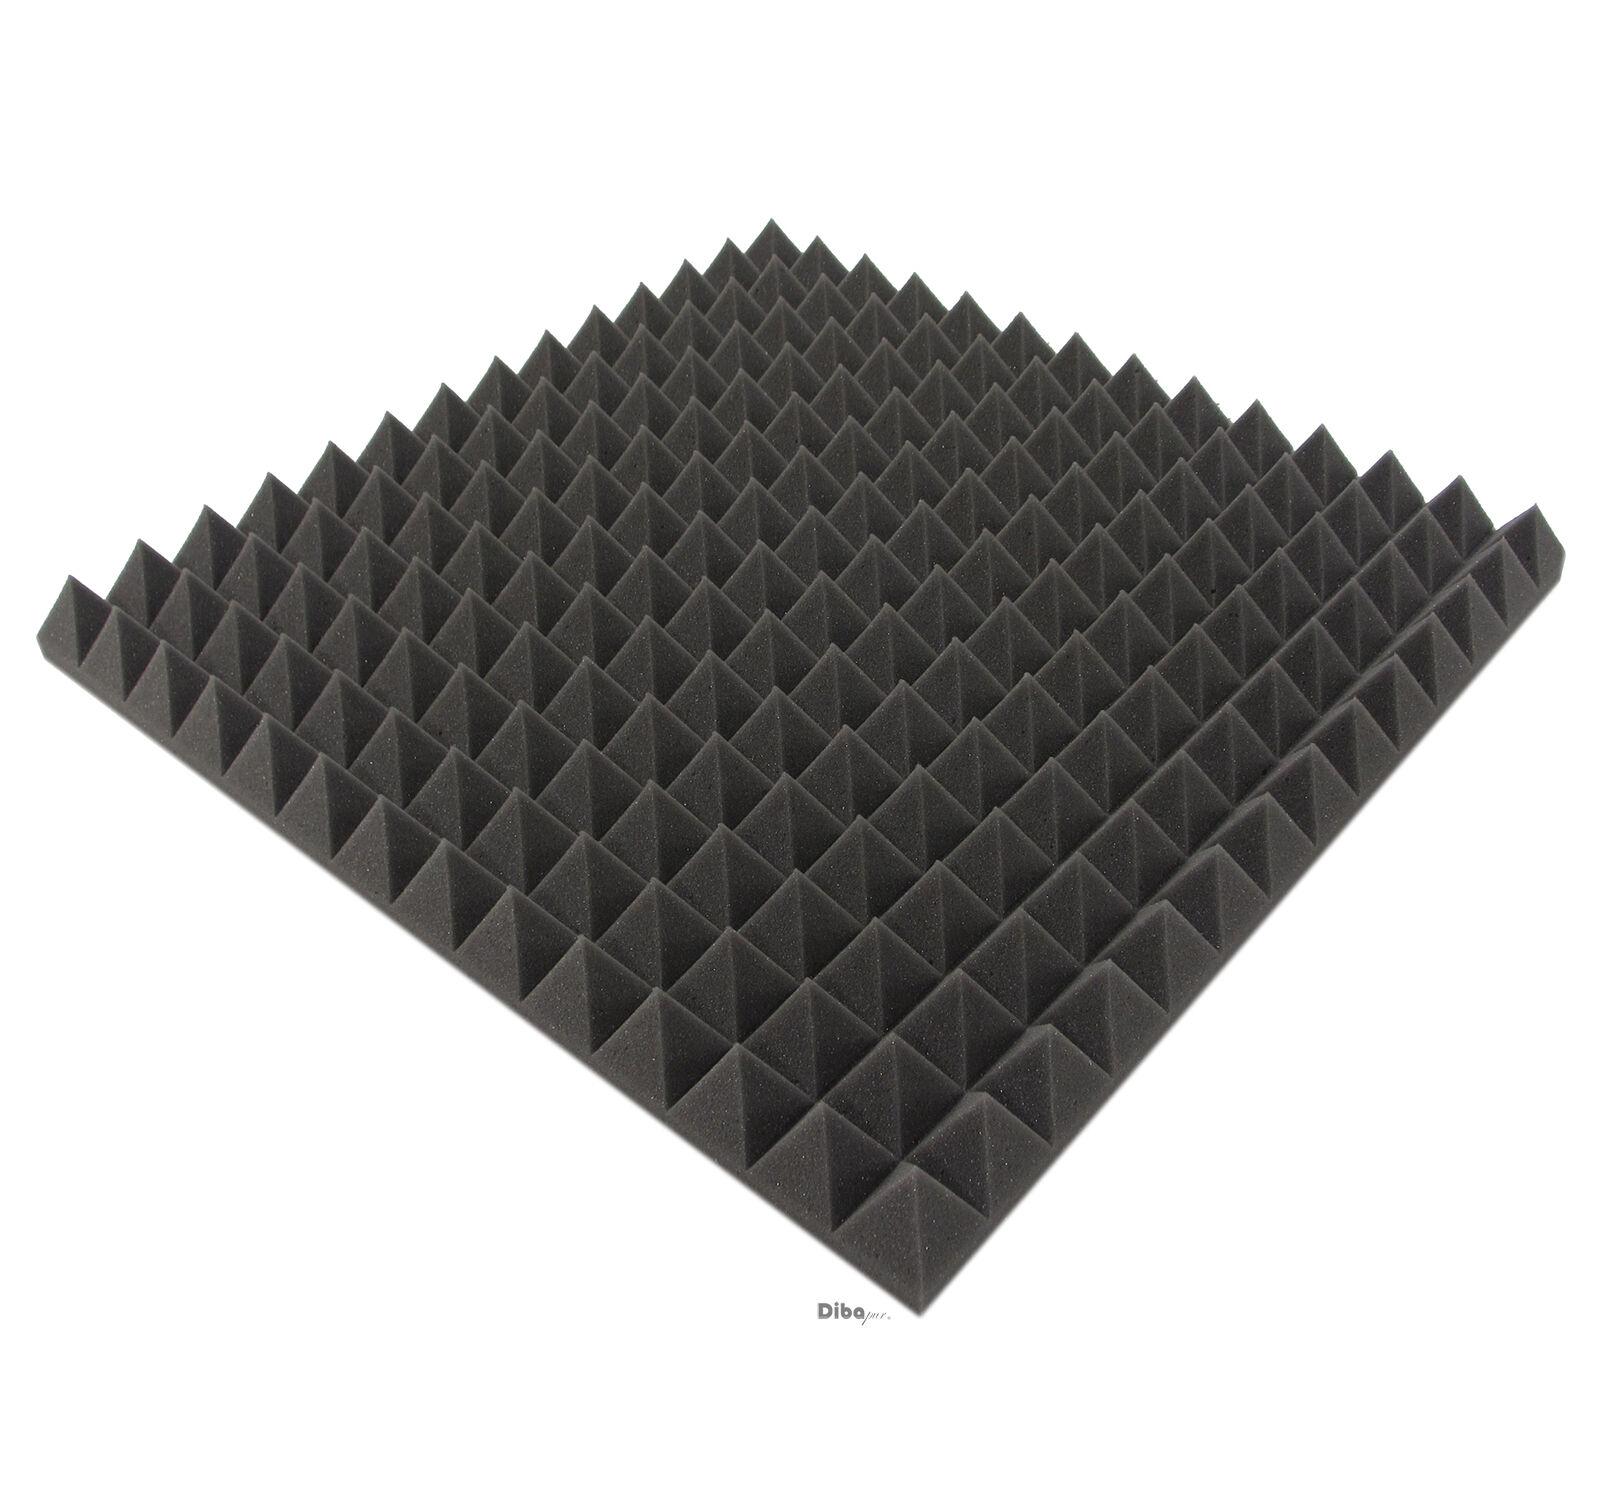 °°° 110m² = 440st. Pyramiden Schaum, Akustik Schaumstoff Dämmung Dämmmatten °°°°